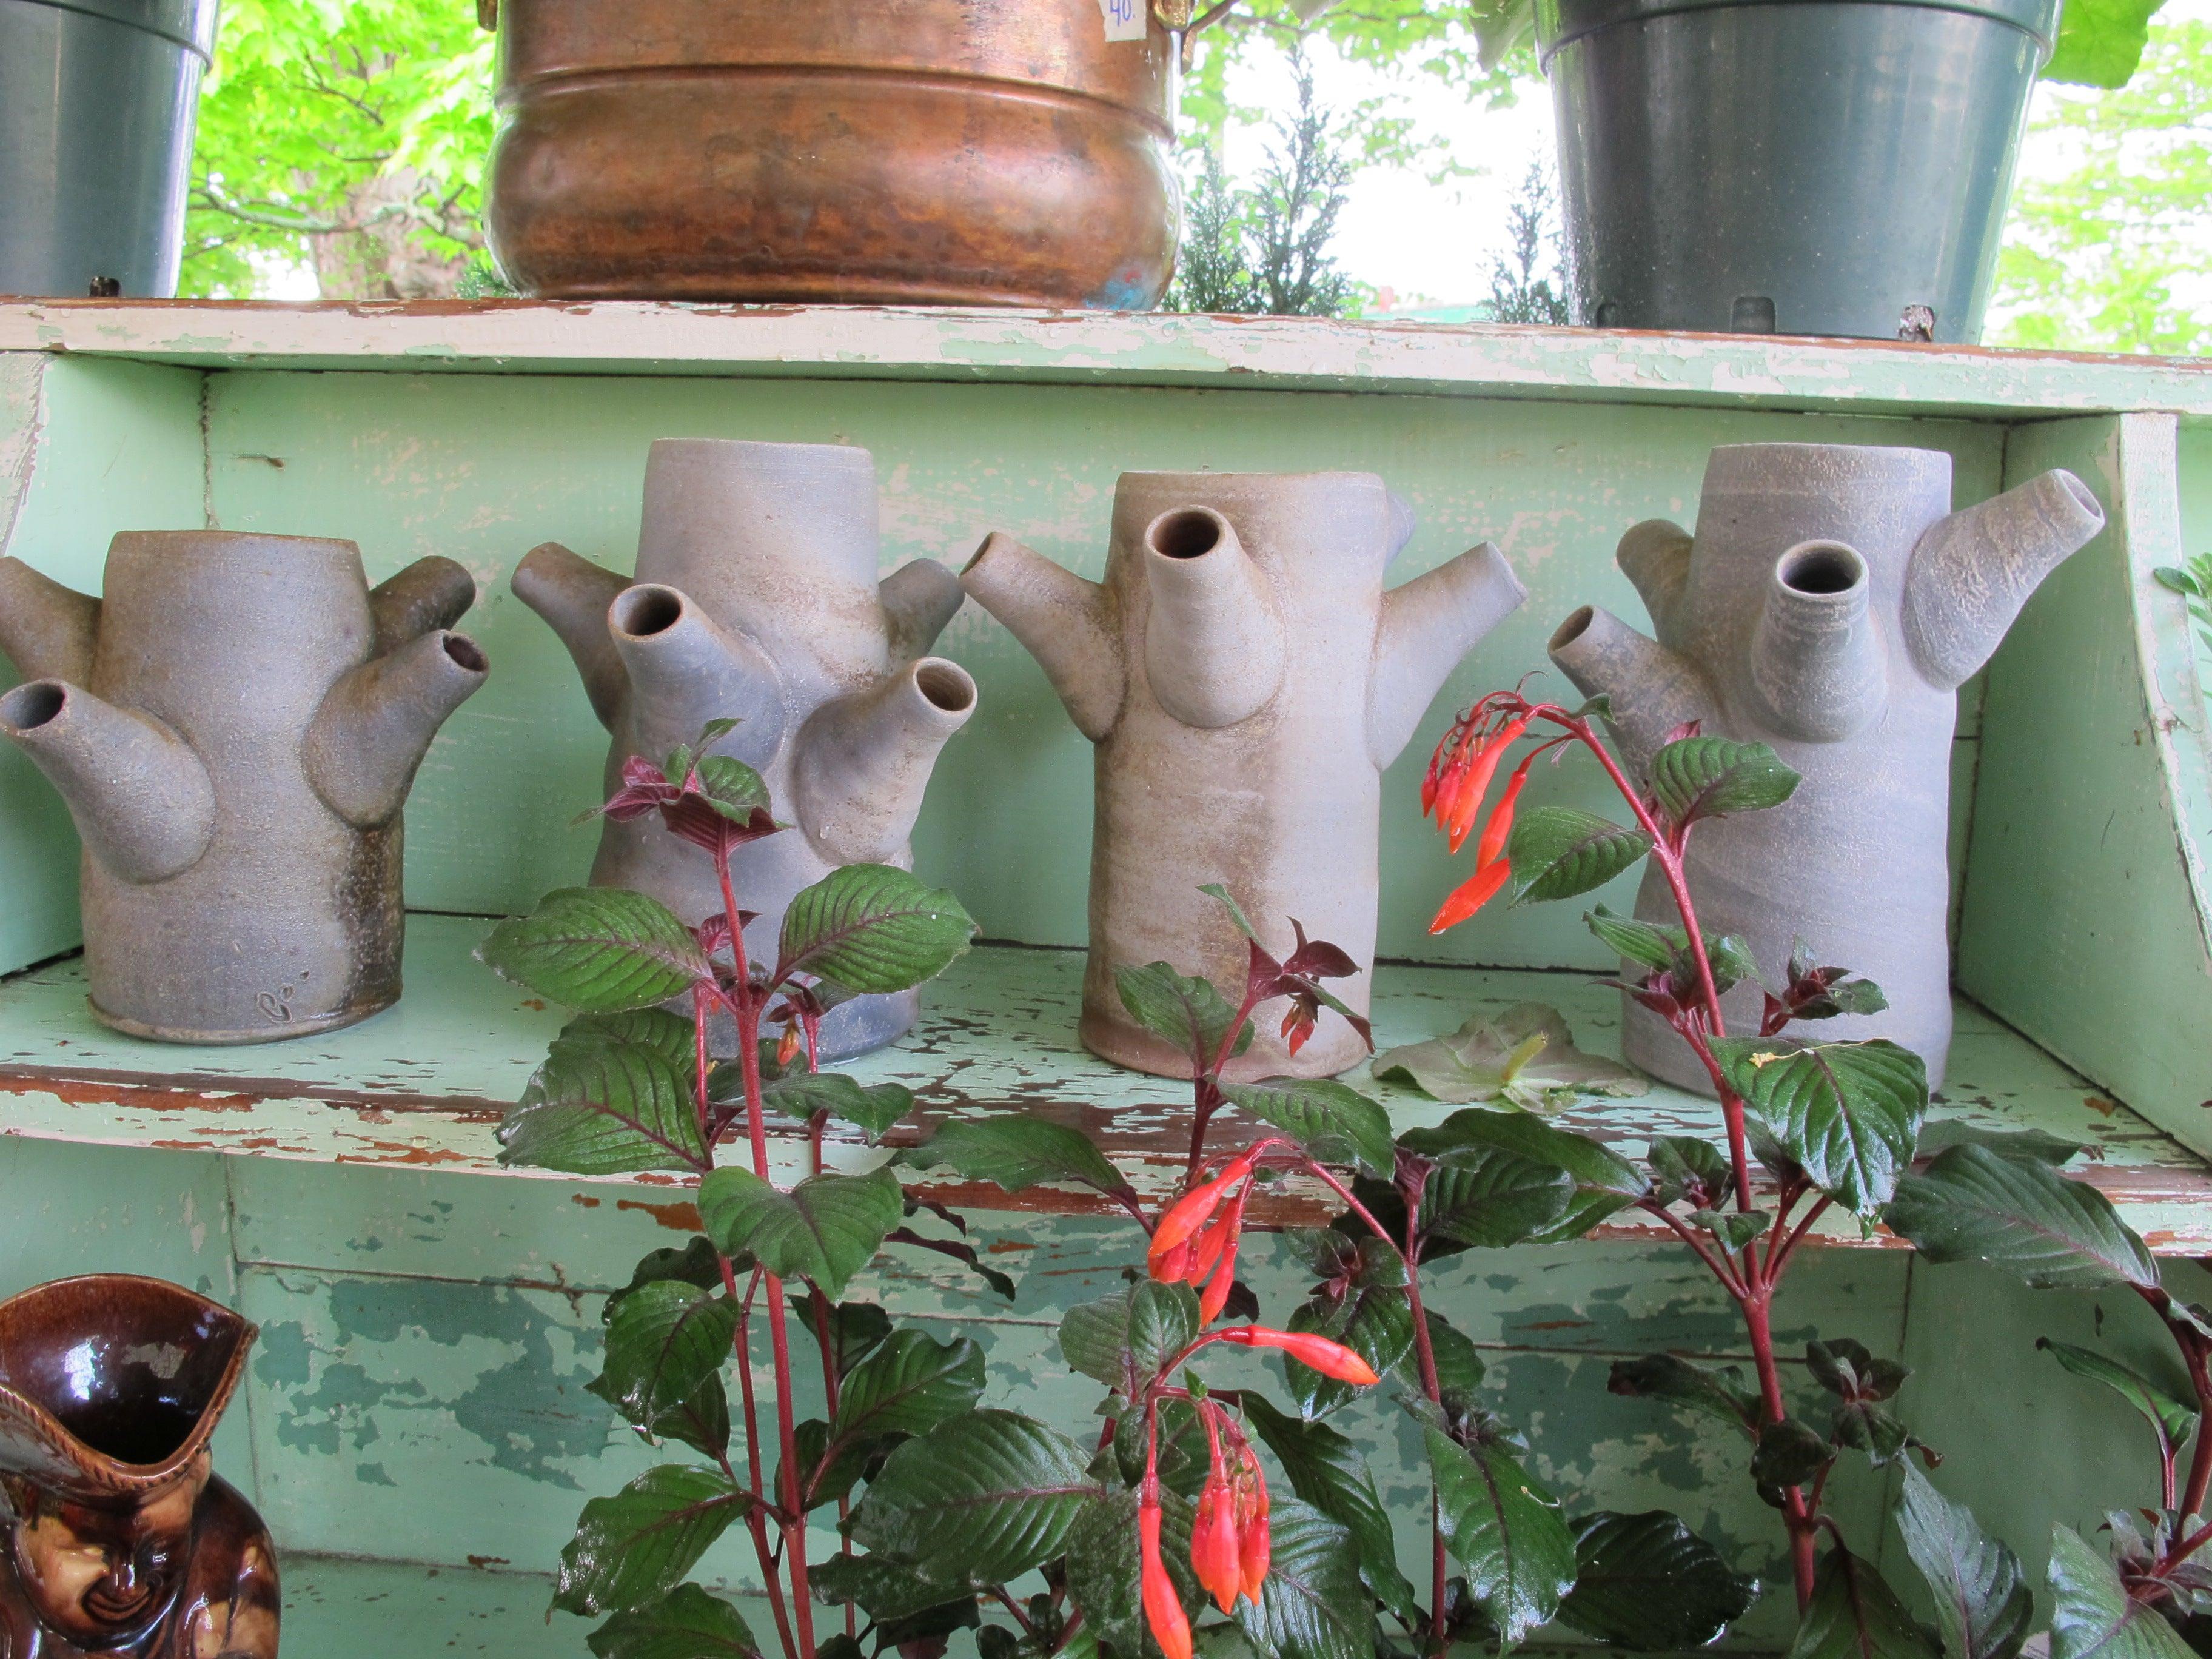 Garden antiques at Trade Secrets